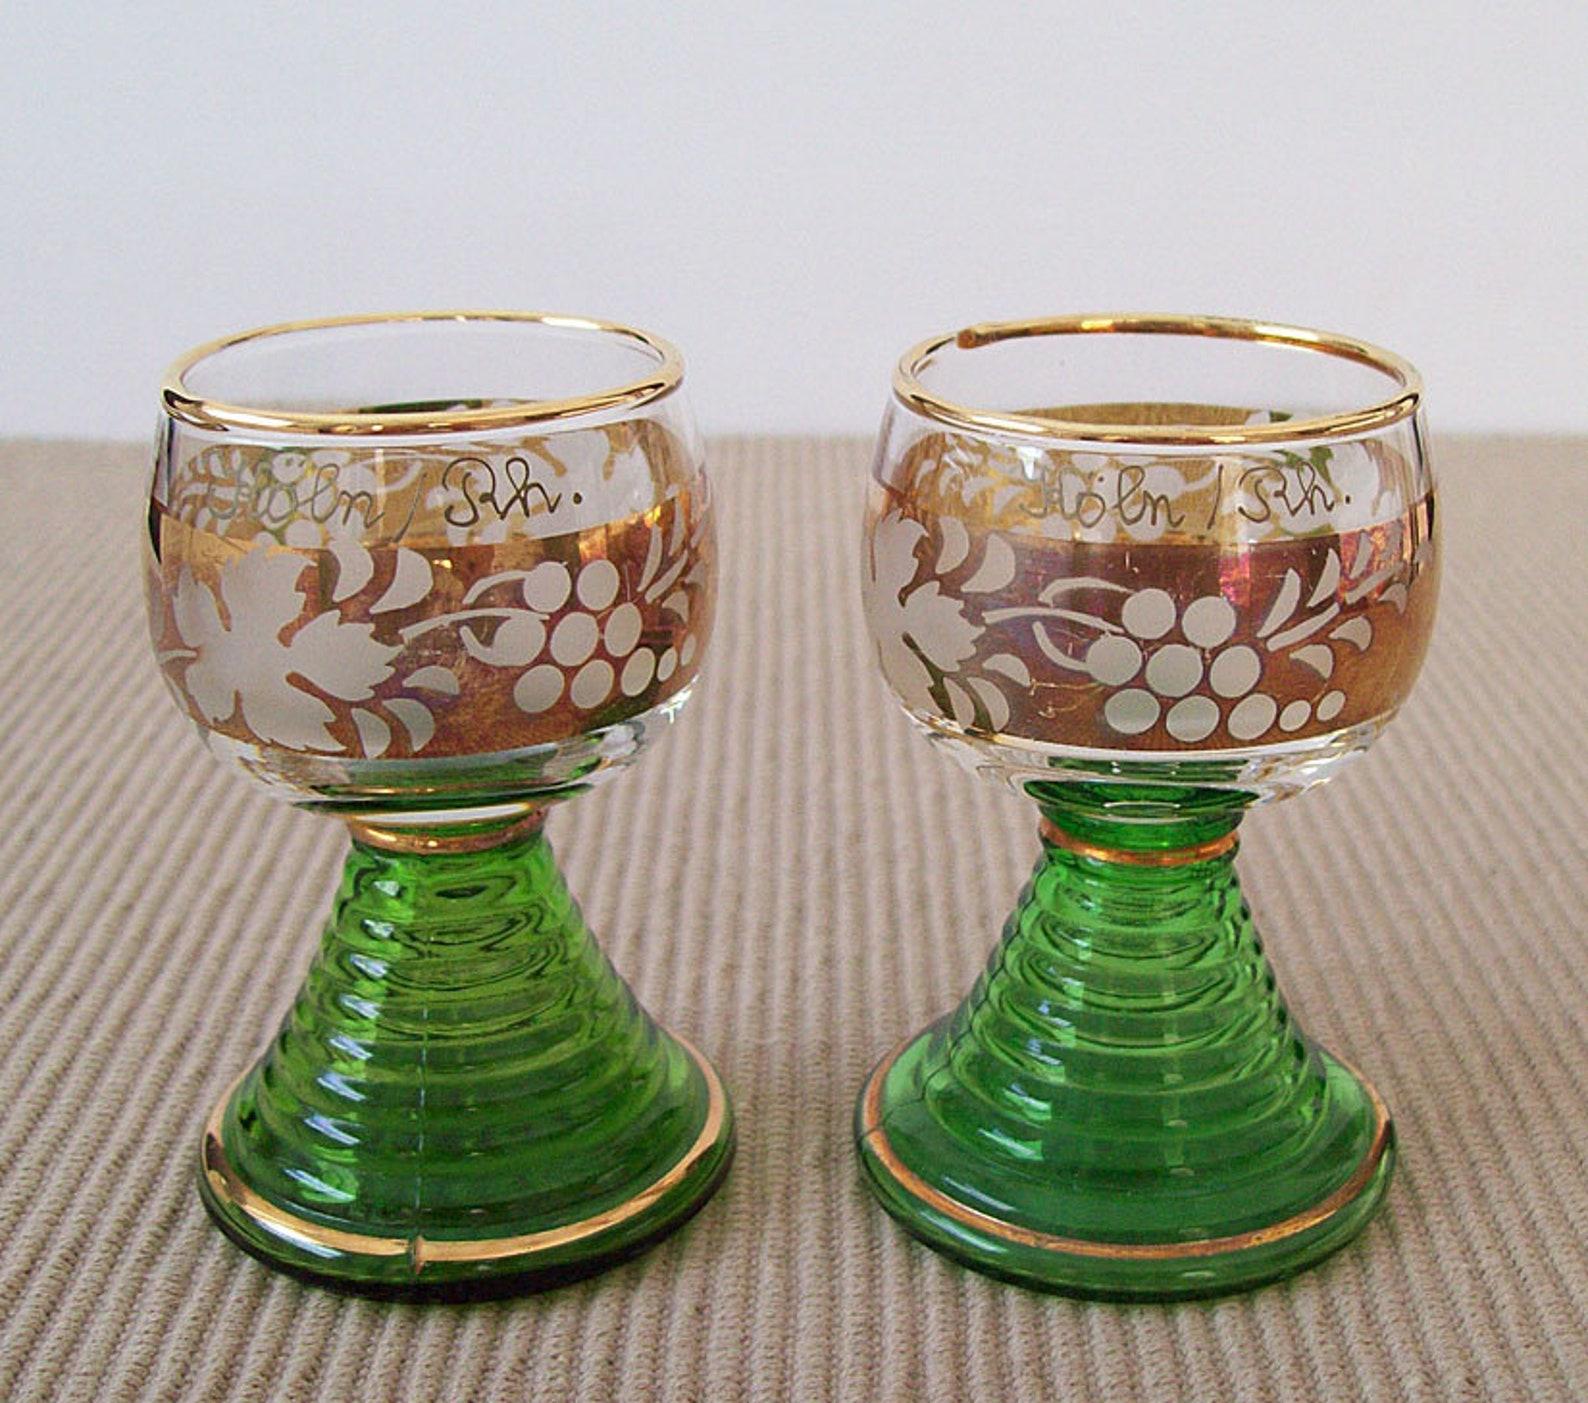 ROEMER (Roman) GERMAN Schnapps Glasses – Pair – Koln/Rh – Cologne – Gold Trim – Beehive Stem – Romer - Shot Glasses -Vintage -